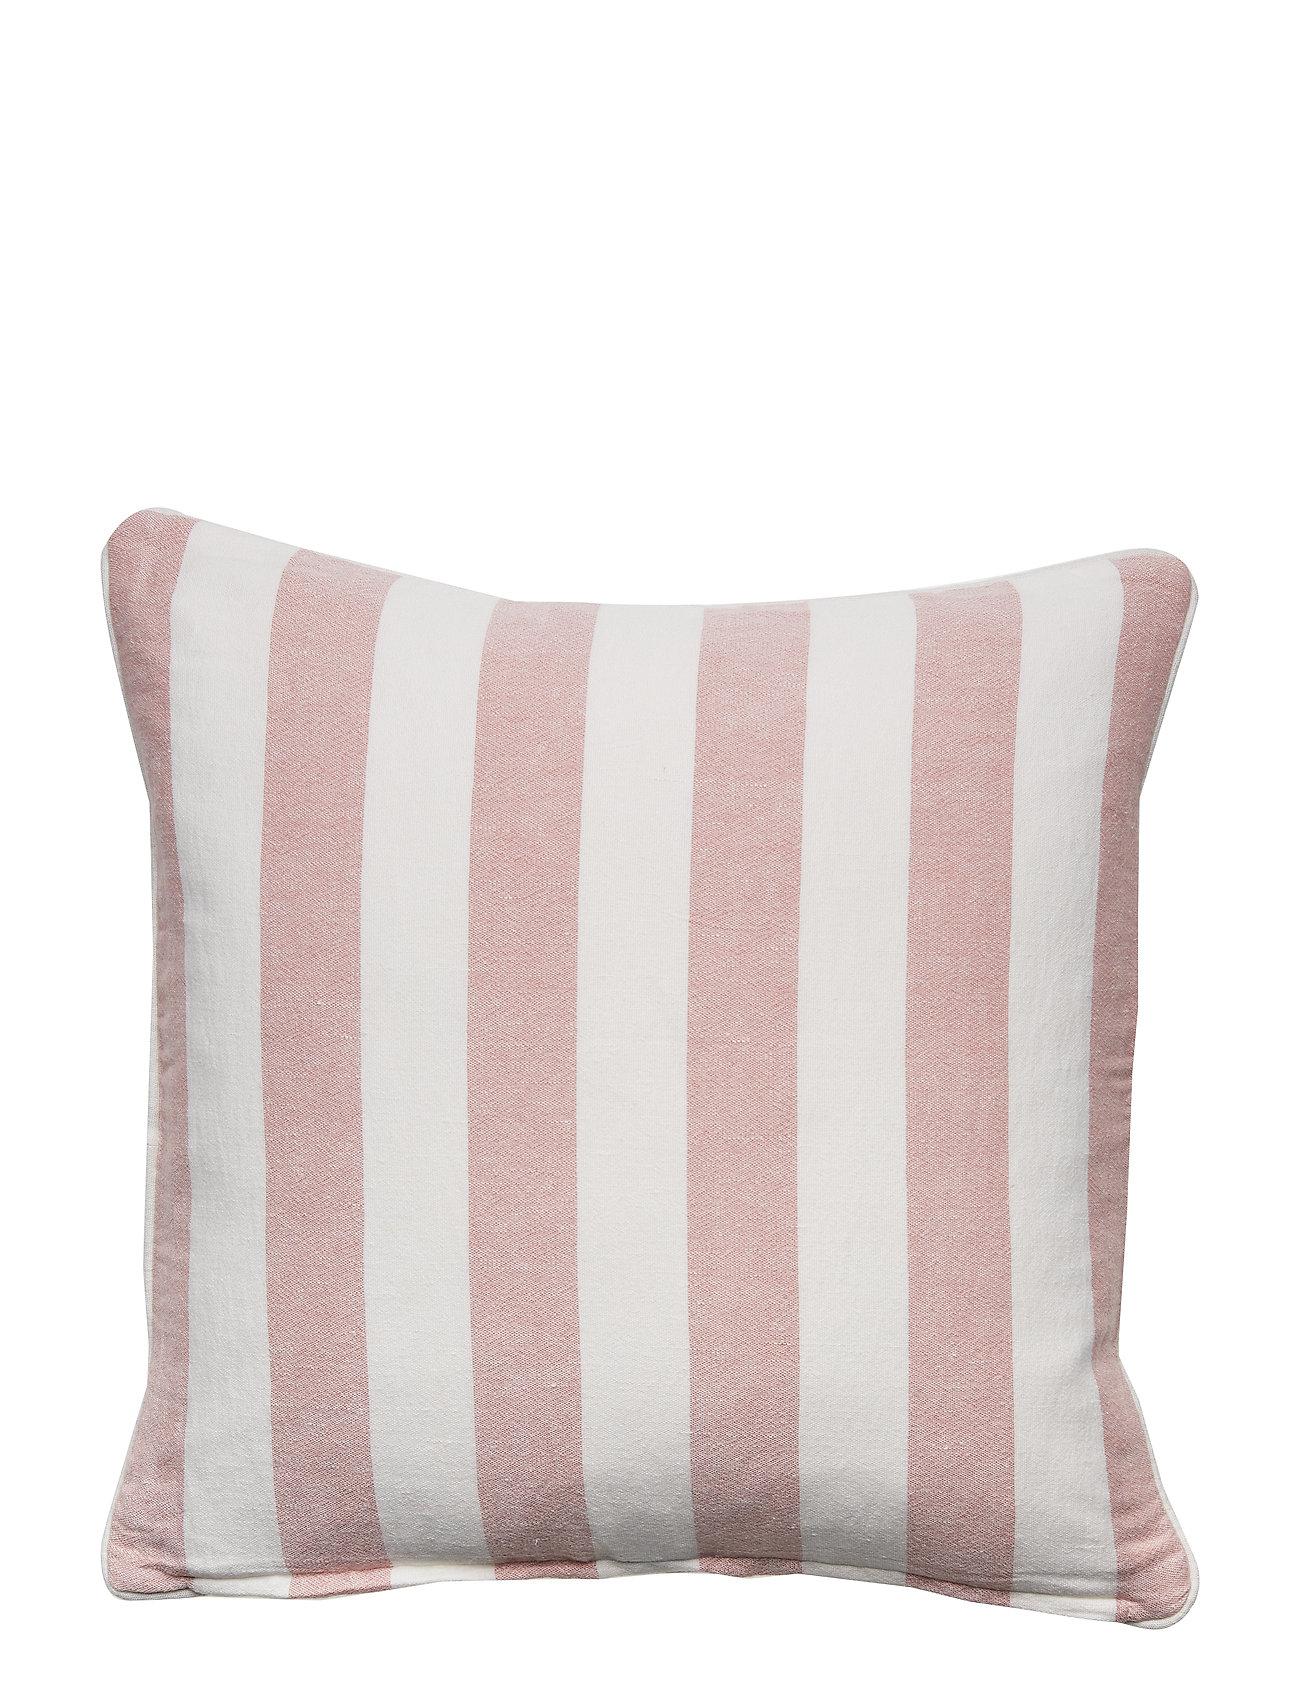 Lexington Home Viscose/Linen Striped Sham - PINK/WHITE